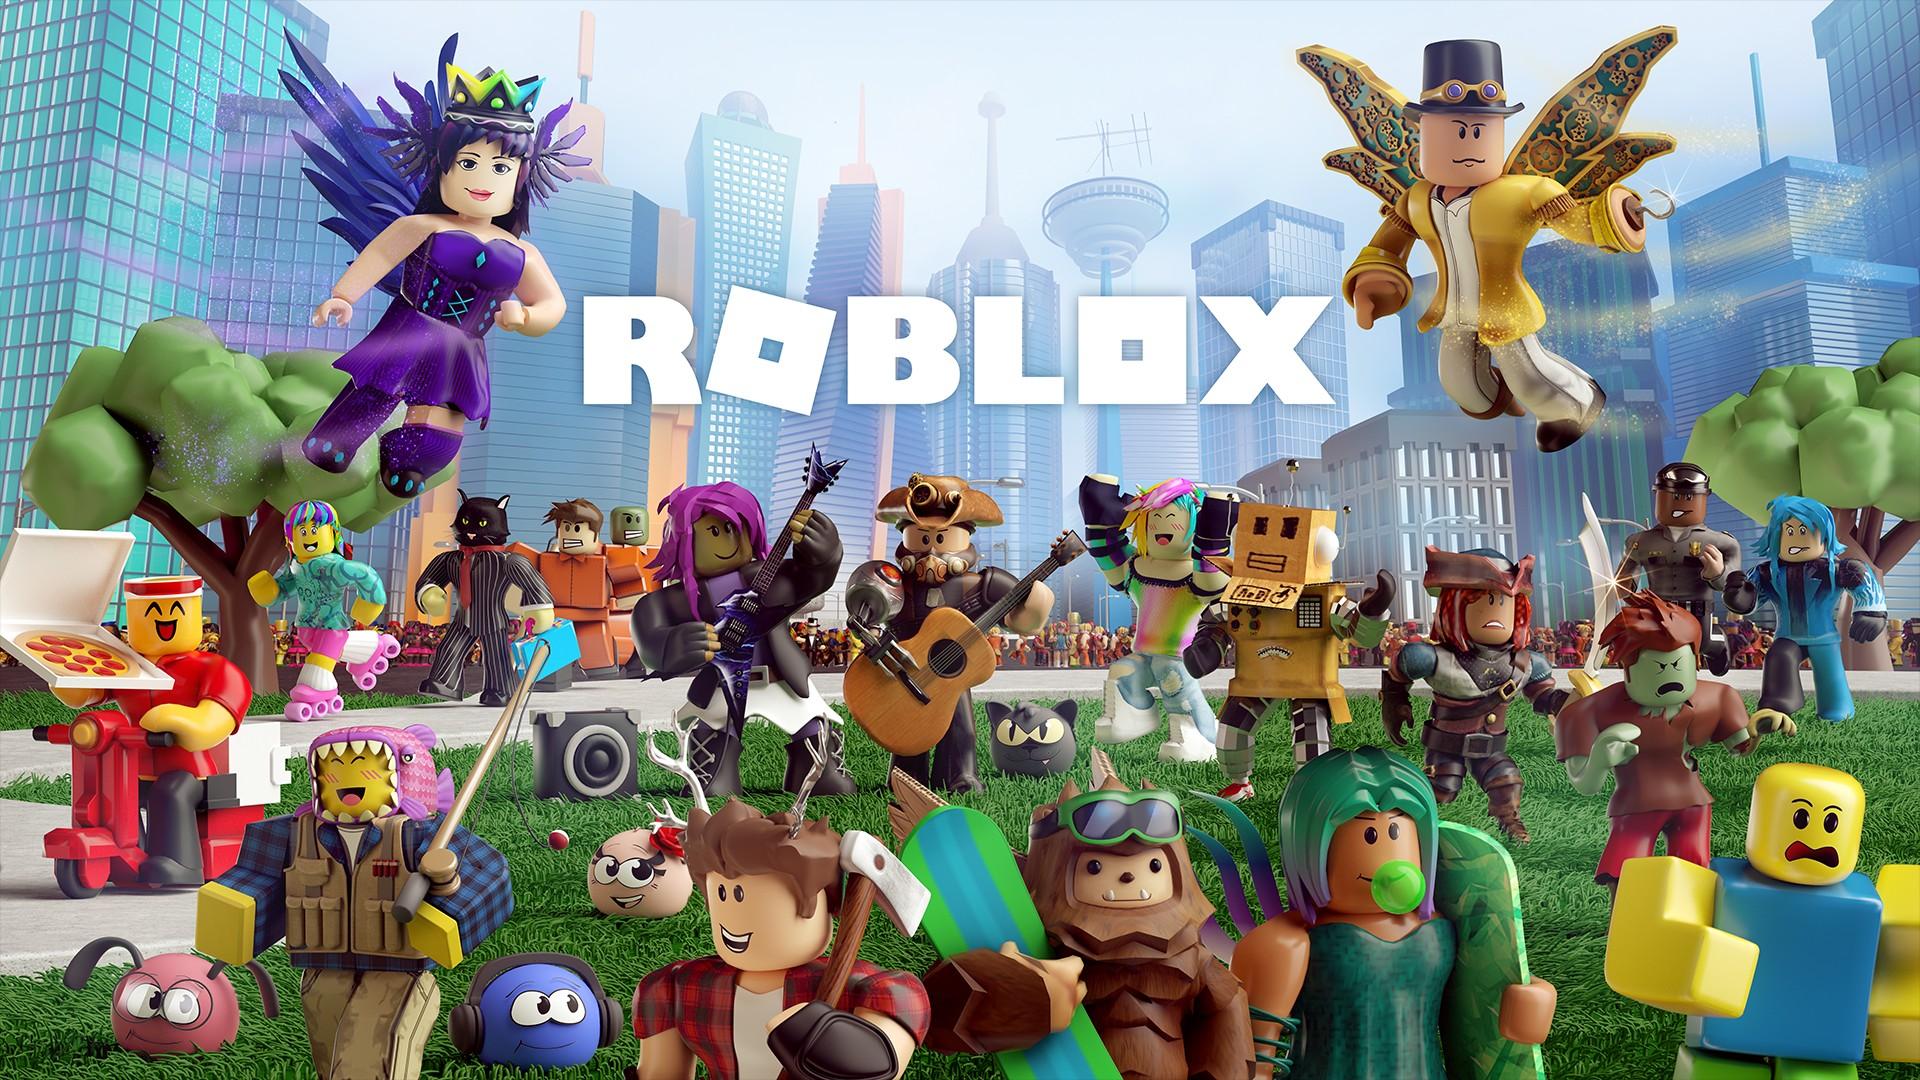 Roblox Desktop Wallpaper